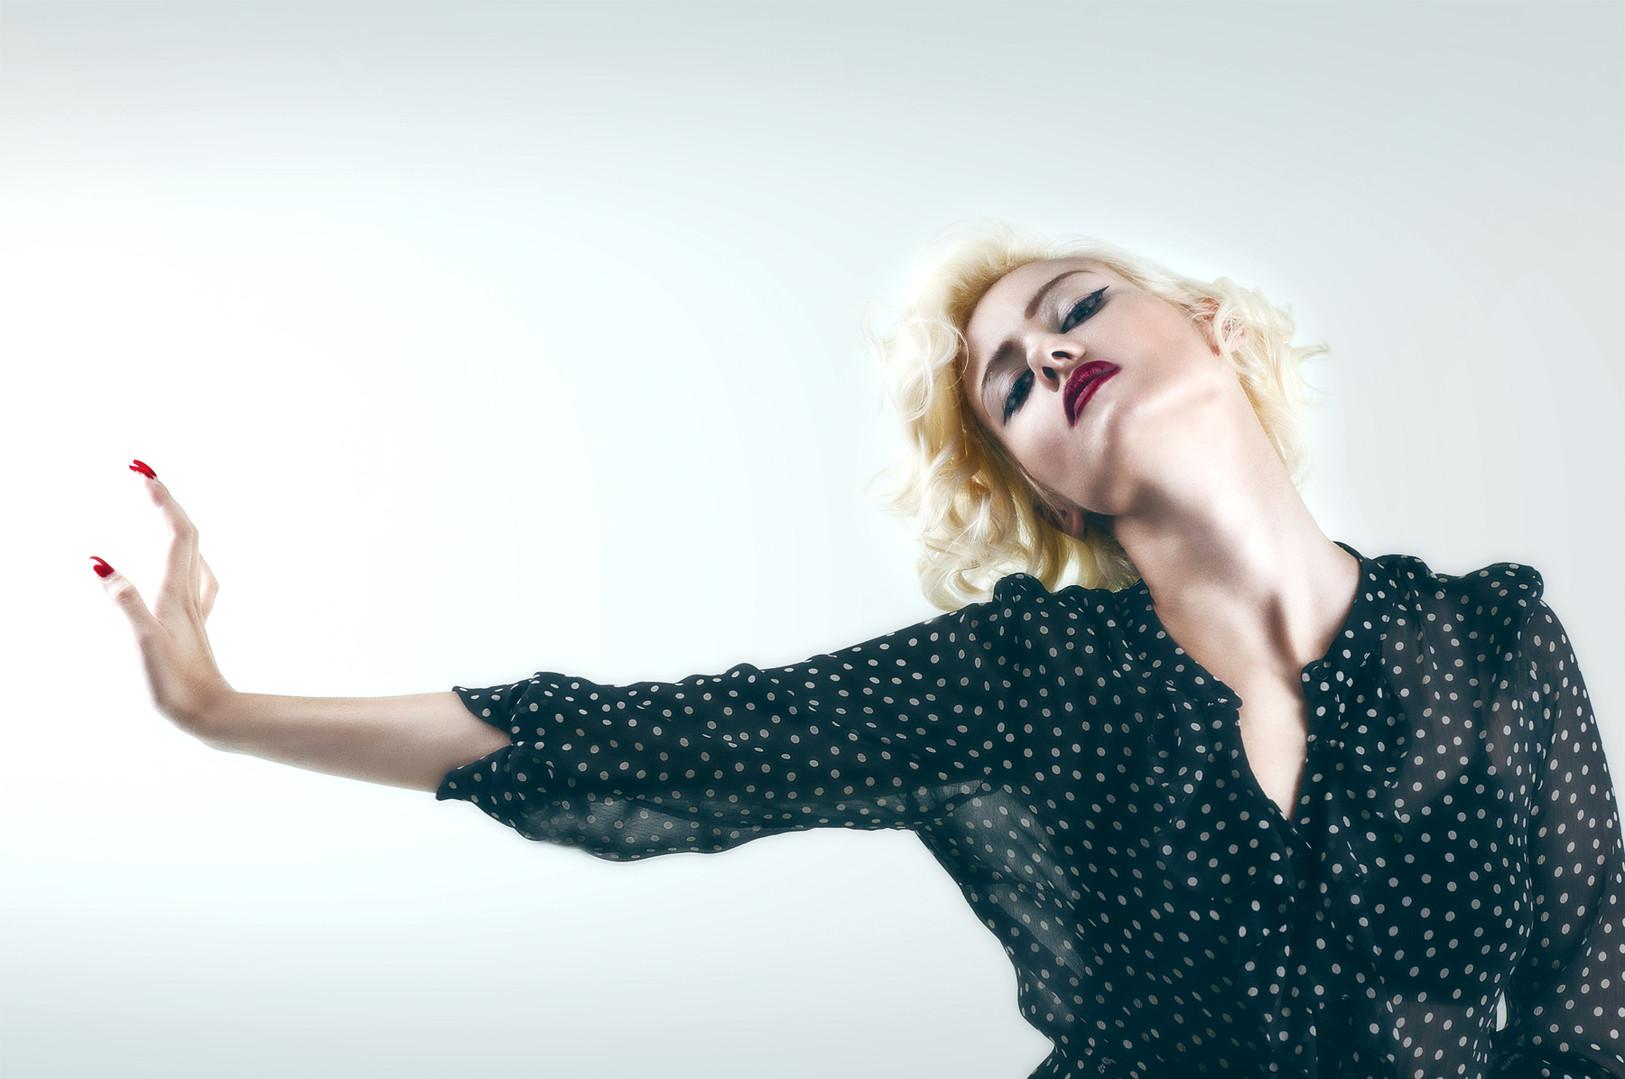 Model: Jane-b Viktoriya  Evento: Open Day Sensuality Project Massimiliano Falso Agenzia 2D